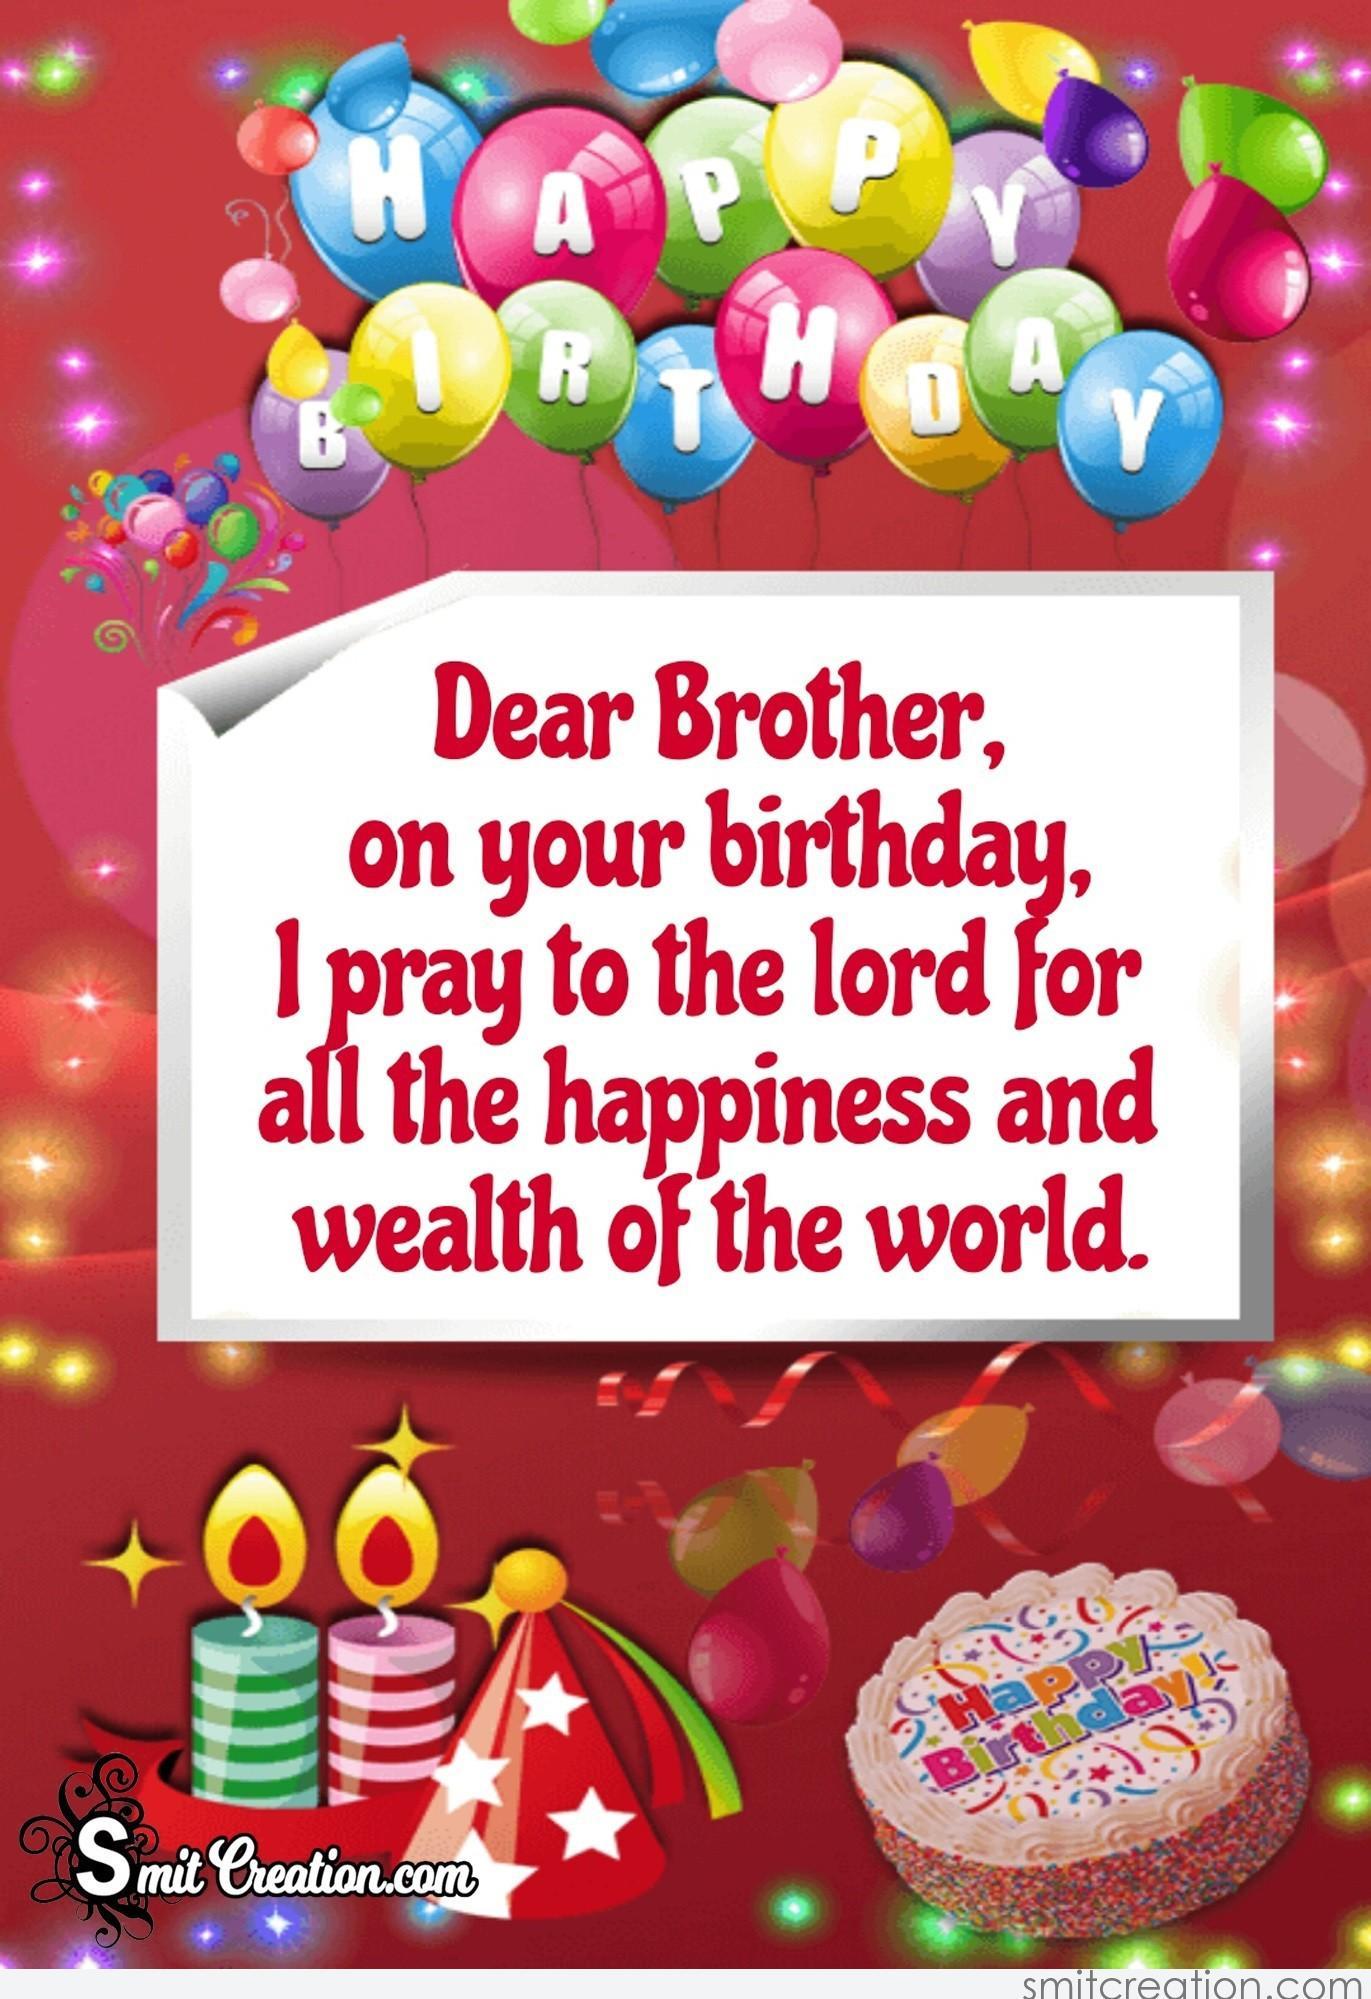 Happy Birthday Brother Smitcreation Com